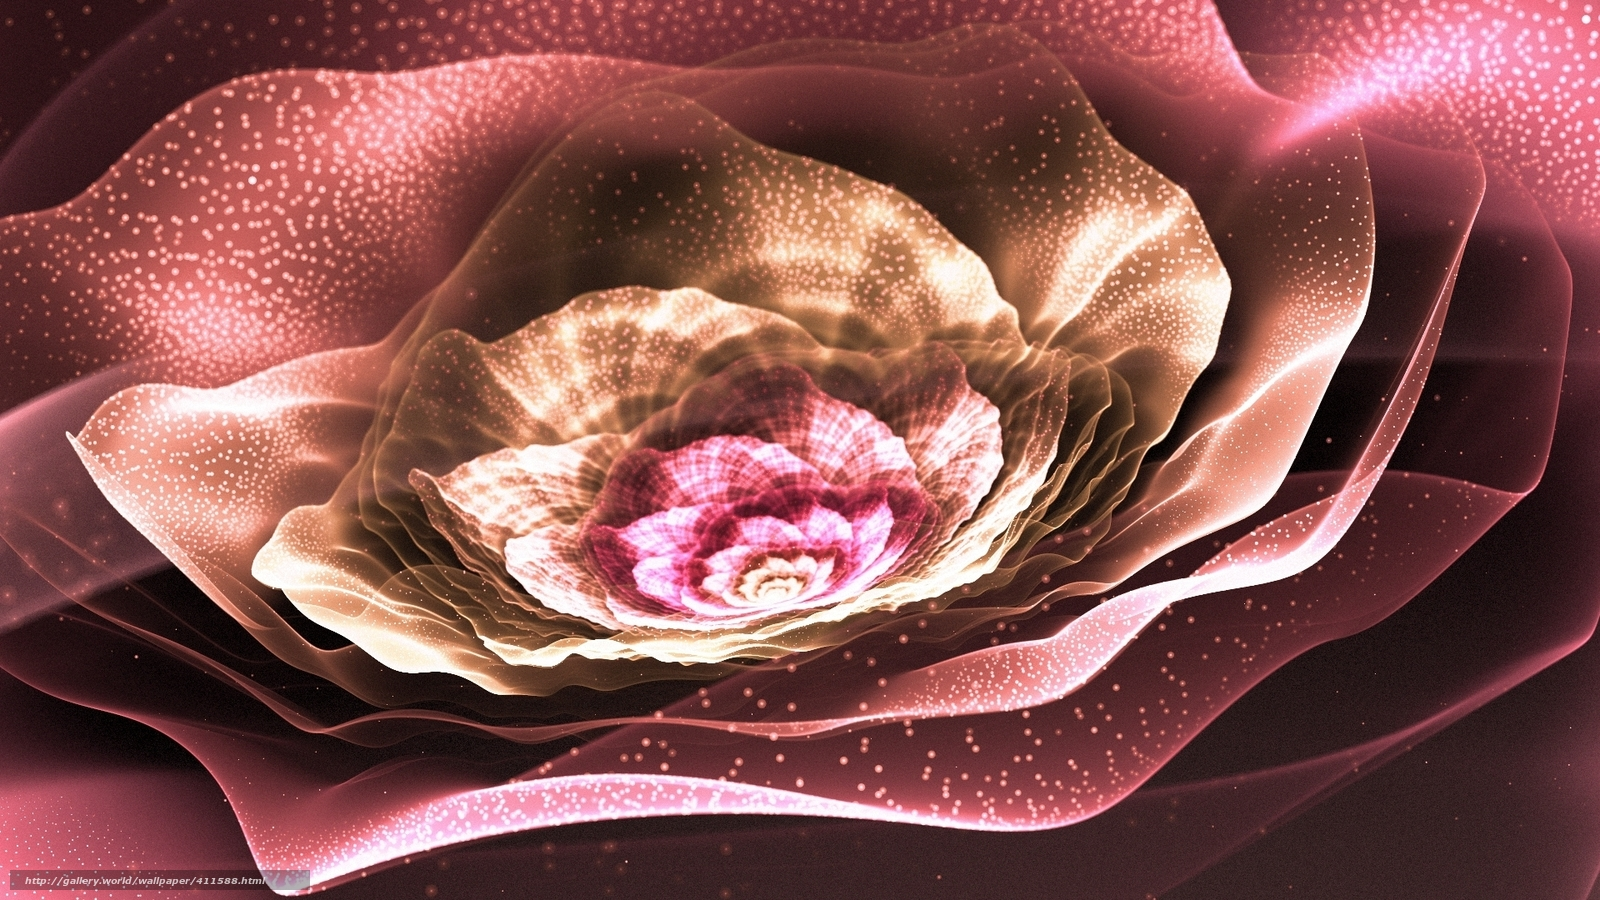 Download wallpaper Art,  fractal,  flower,  Petals free desktop wallpaper in the resolution 1920x1080 — picture №411588